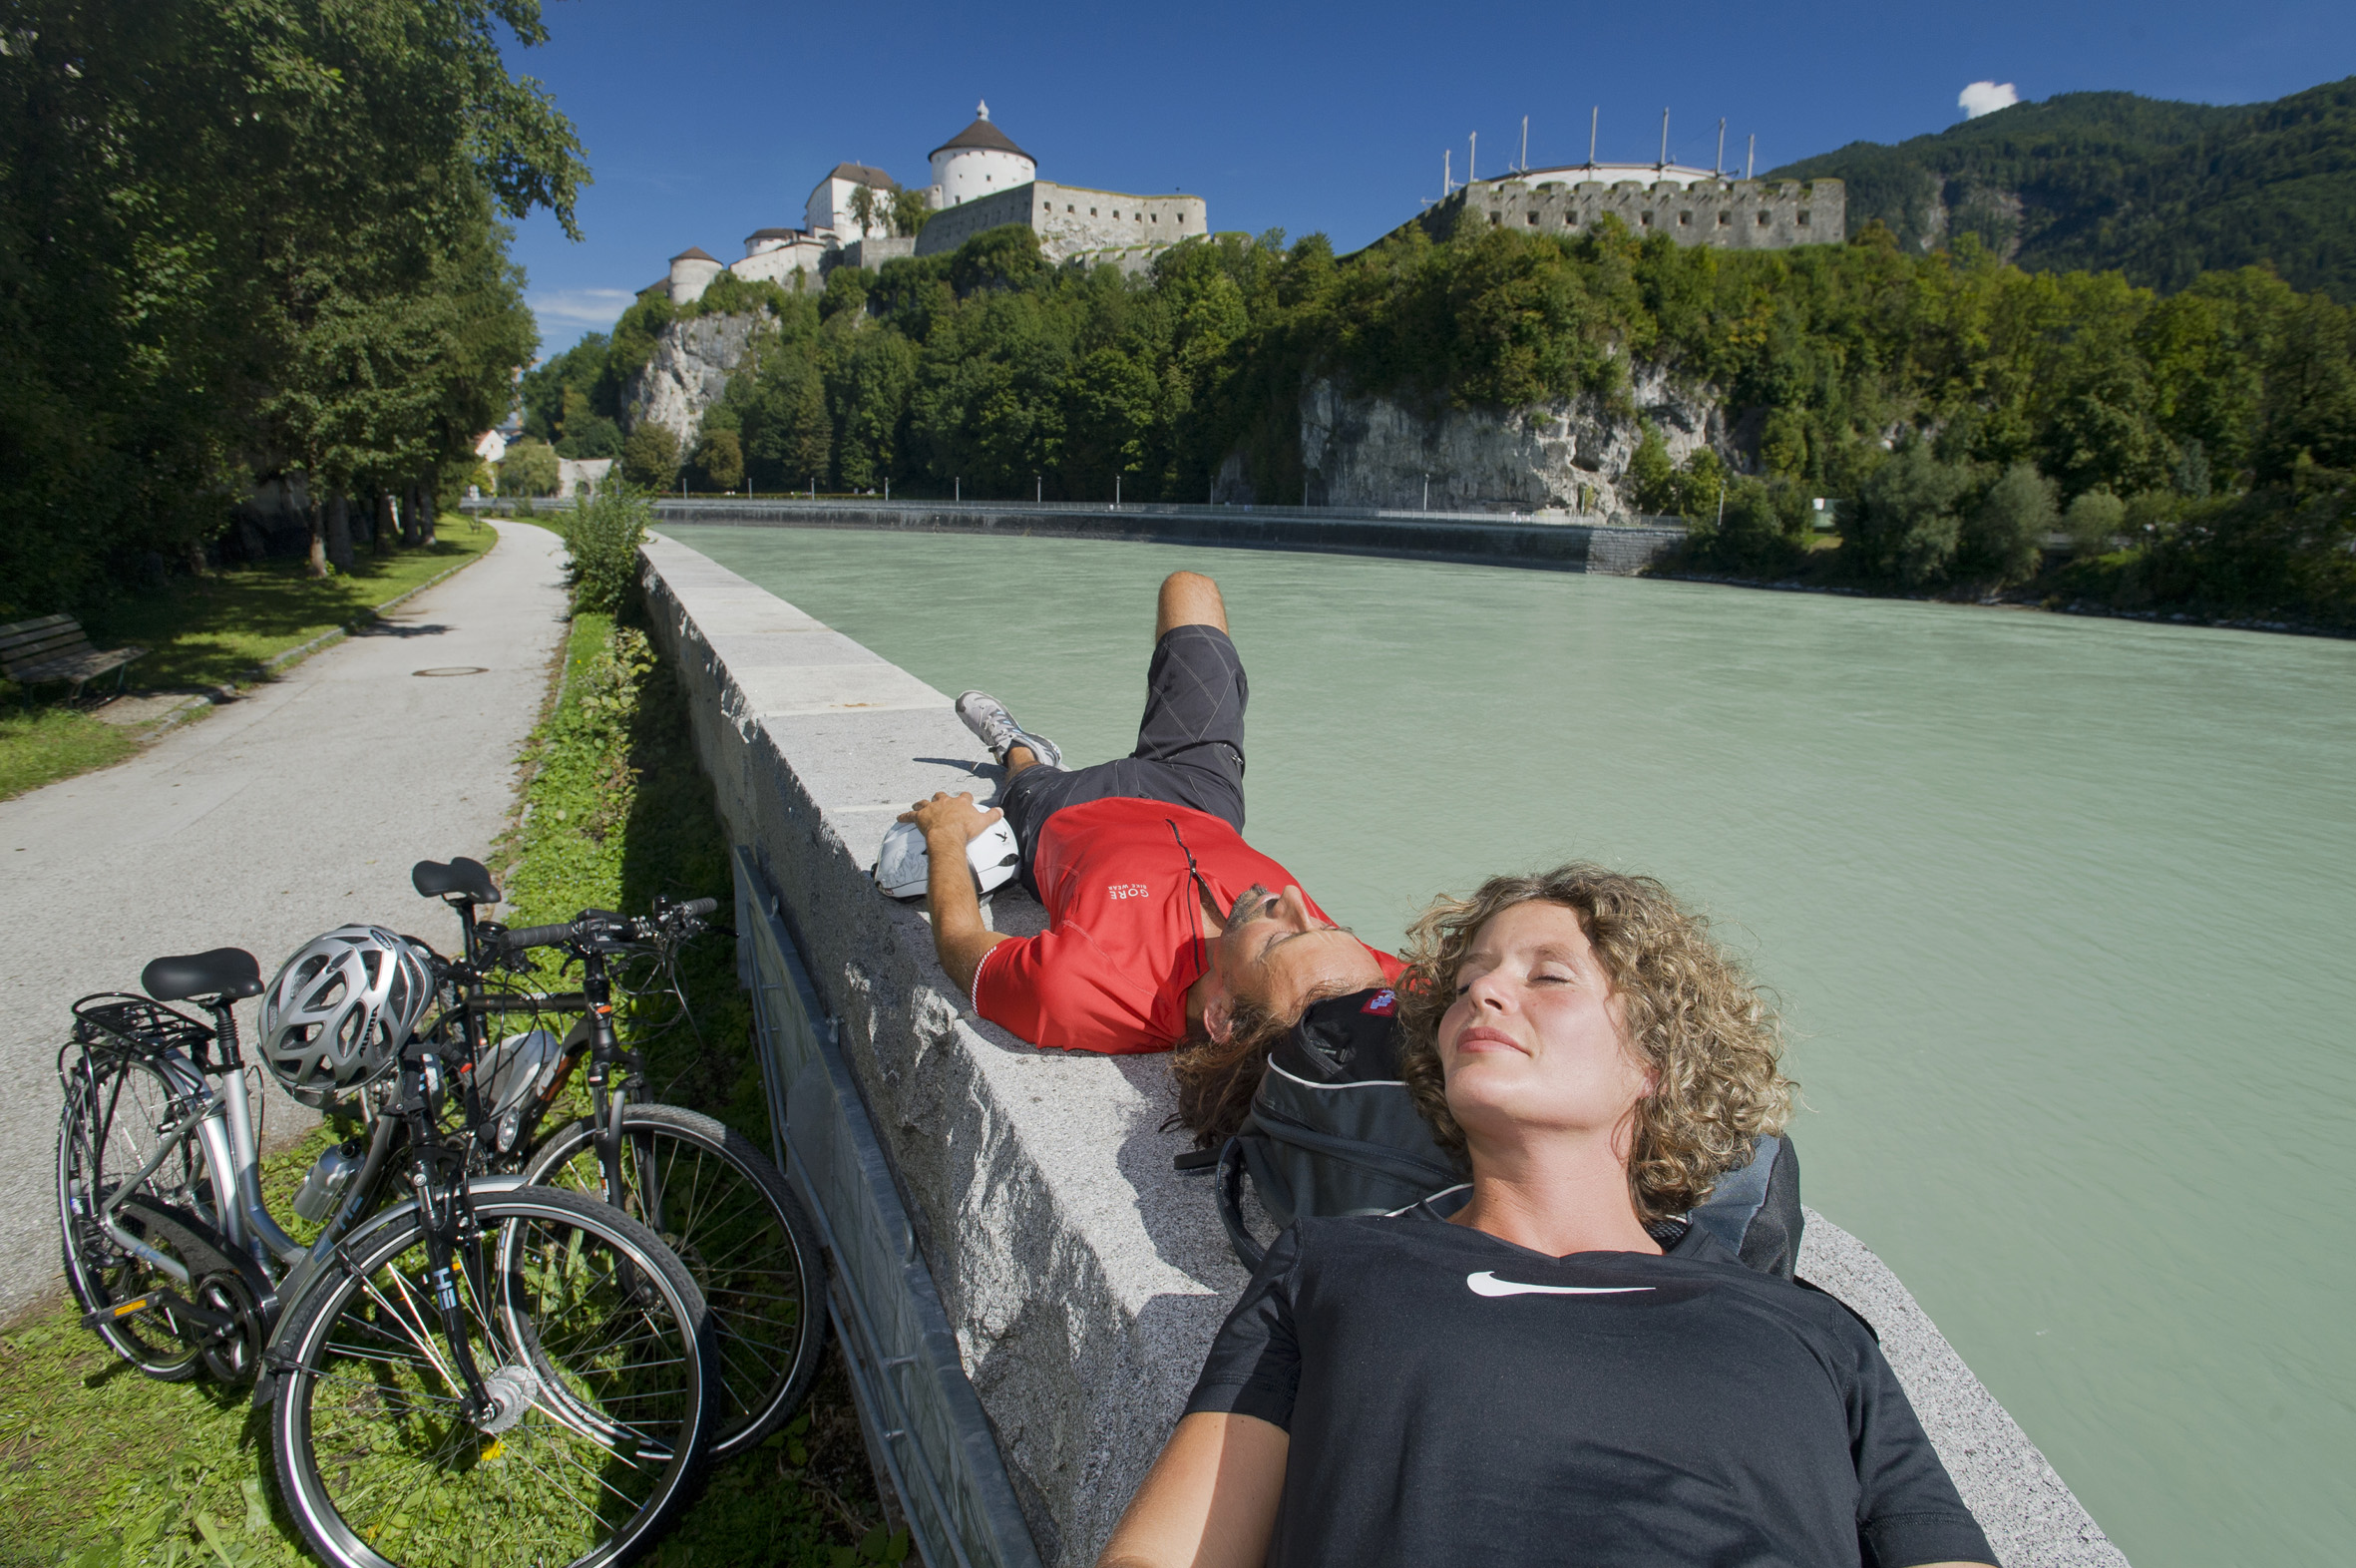 Inn Sonnenbad Radler TirolWerbung NorbertFreudenthaler